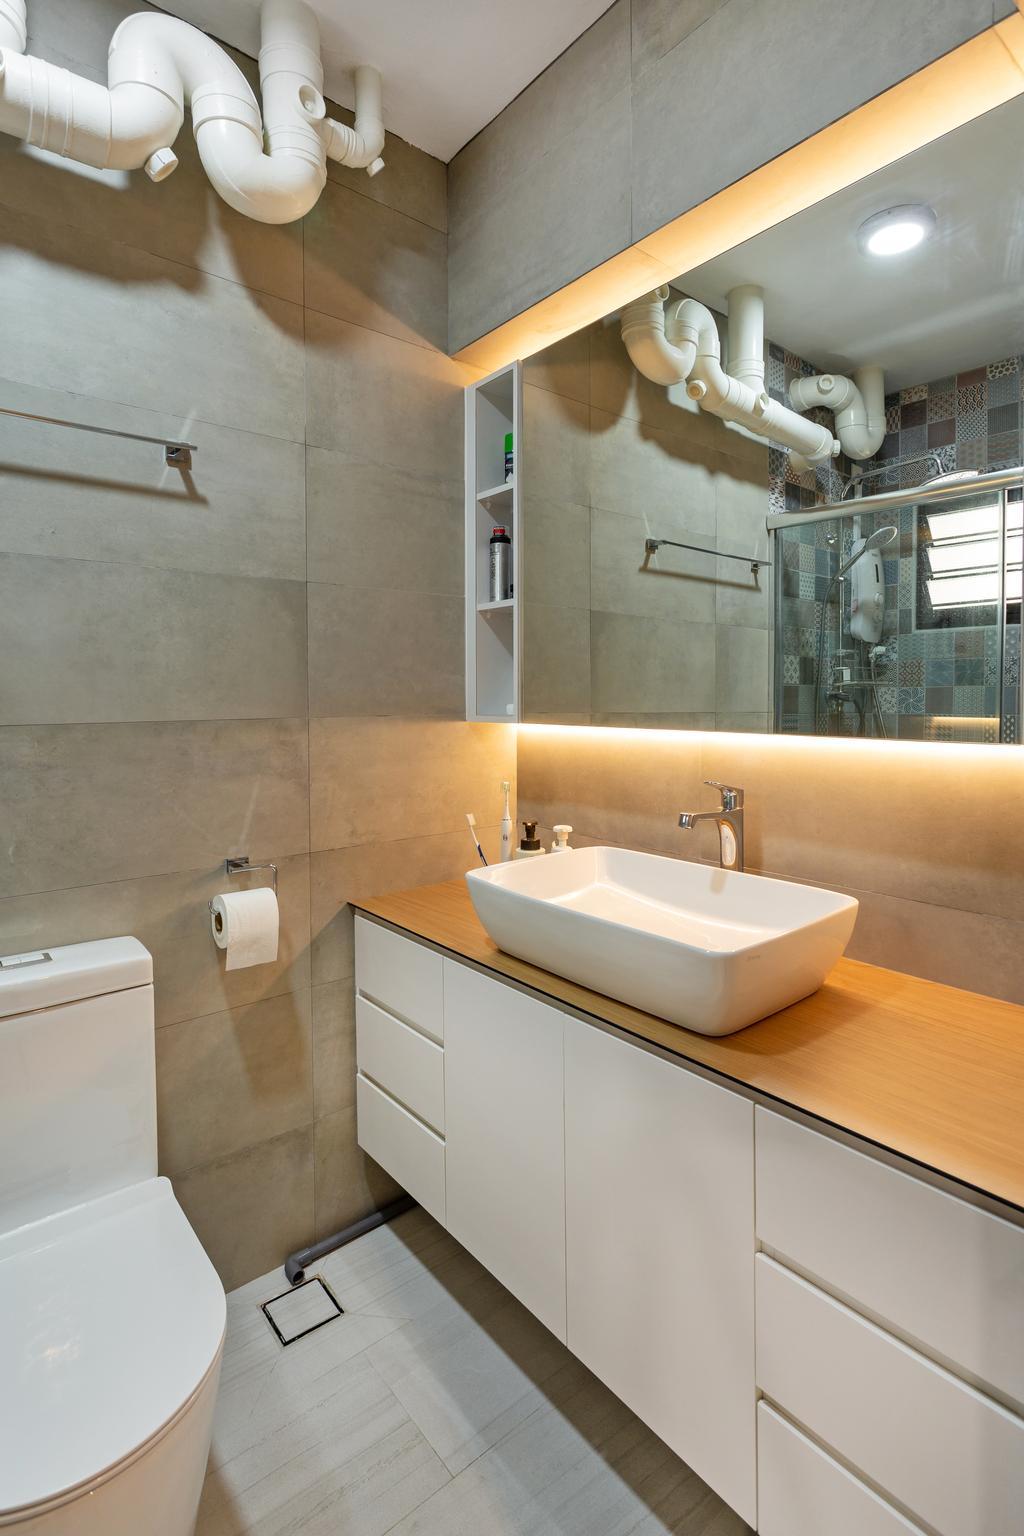 Scandinavian, HDB, Bathroom, Ang Mo Kio Street 31, Interior Designer, The Roomakers, Sink, Paper, Paper Towel, Tissue, Toilet Paper, Towel, Indoors, Interior Design, Room